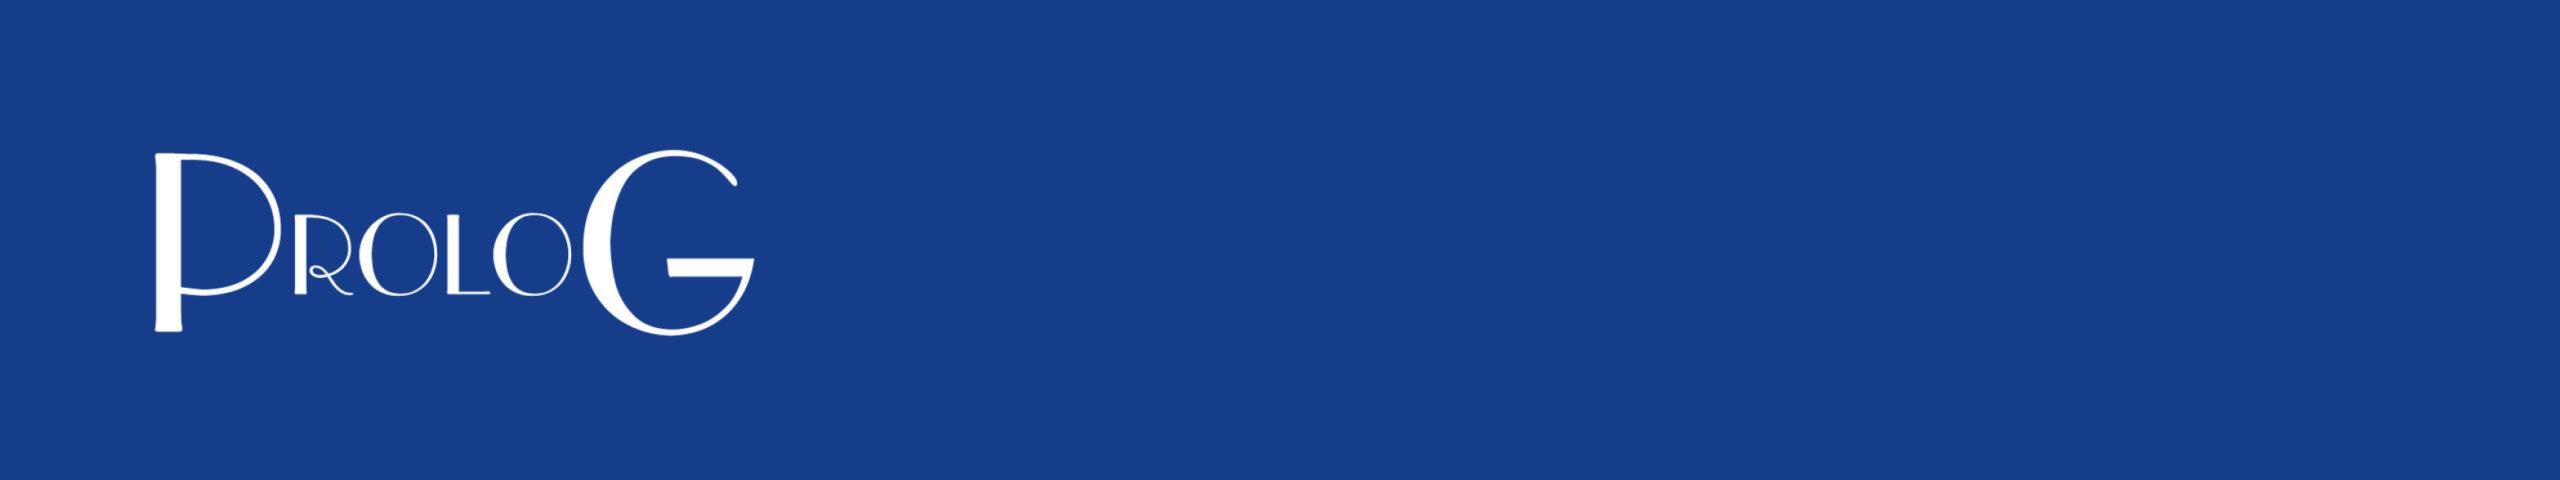 prolog.org Logo